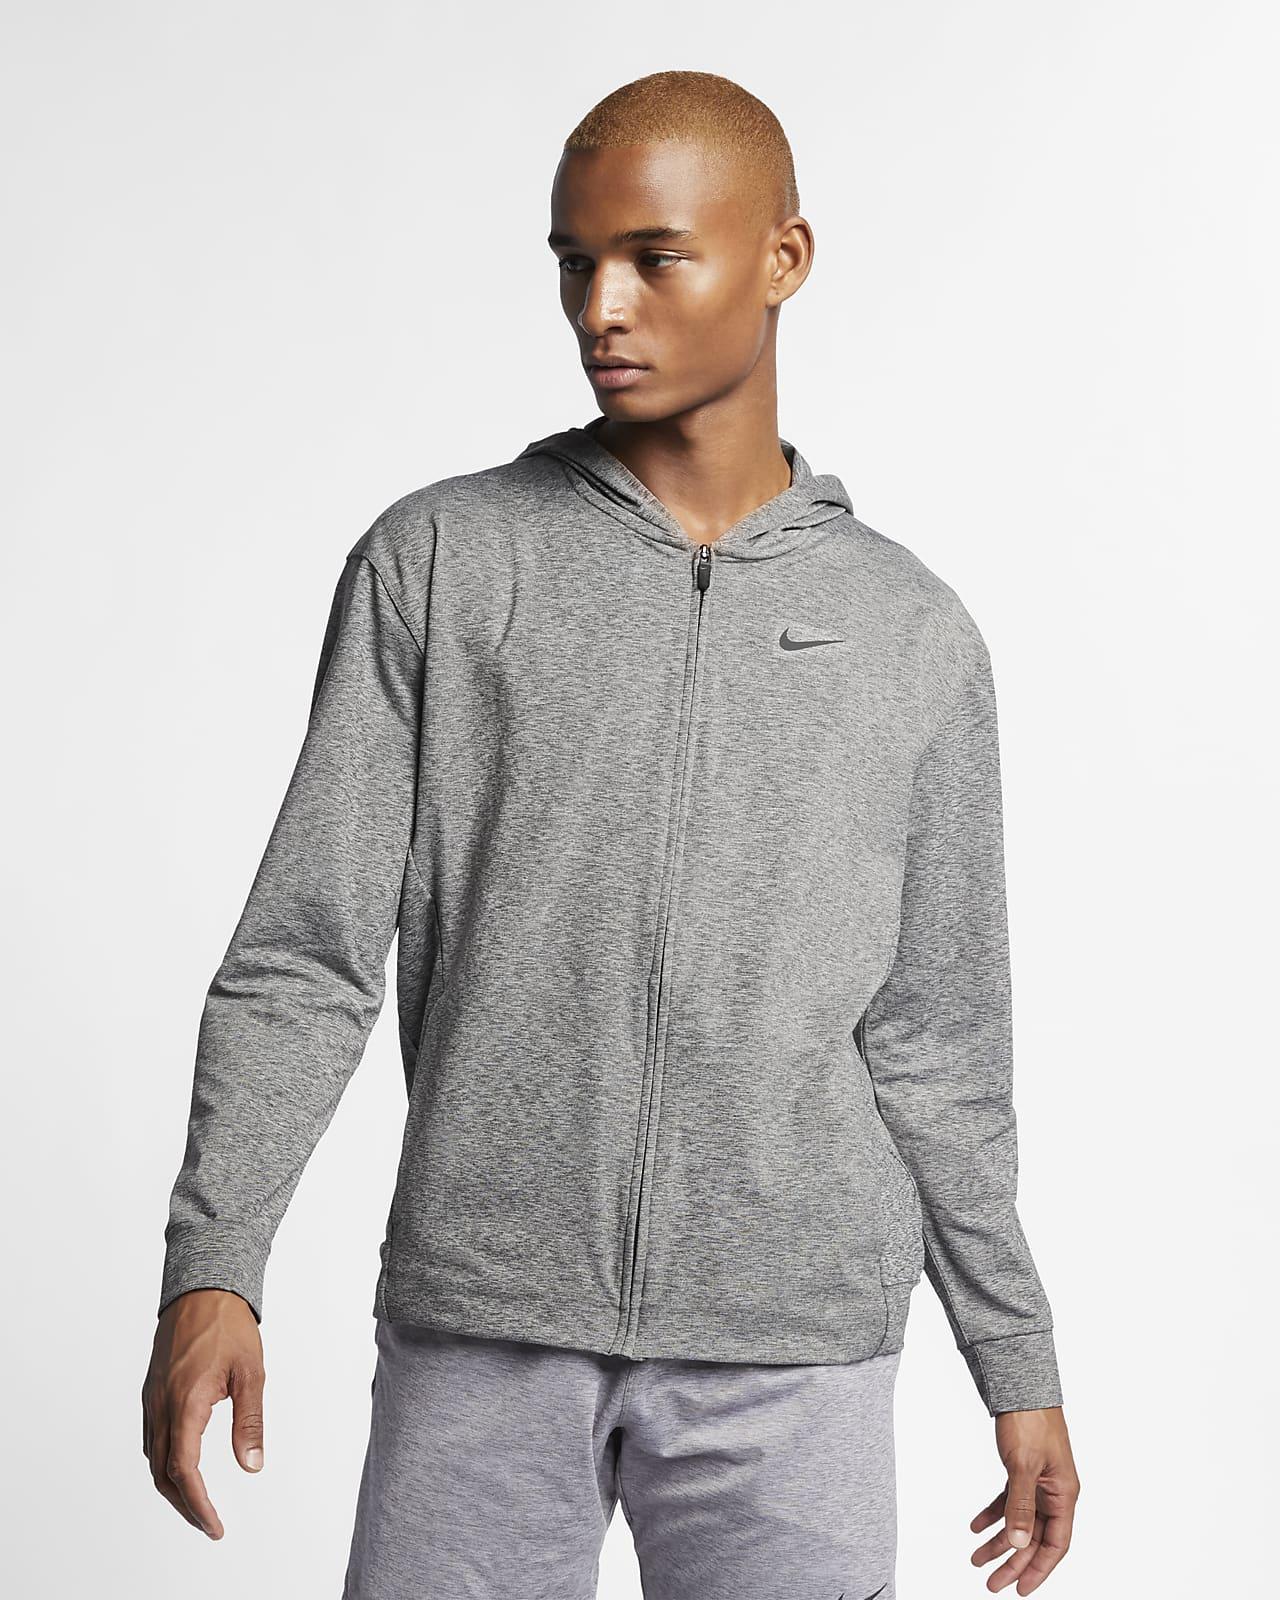 Мужская худи для йоги с молнией во всю длину Nike Dri-FIT